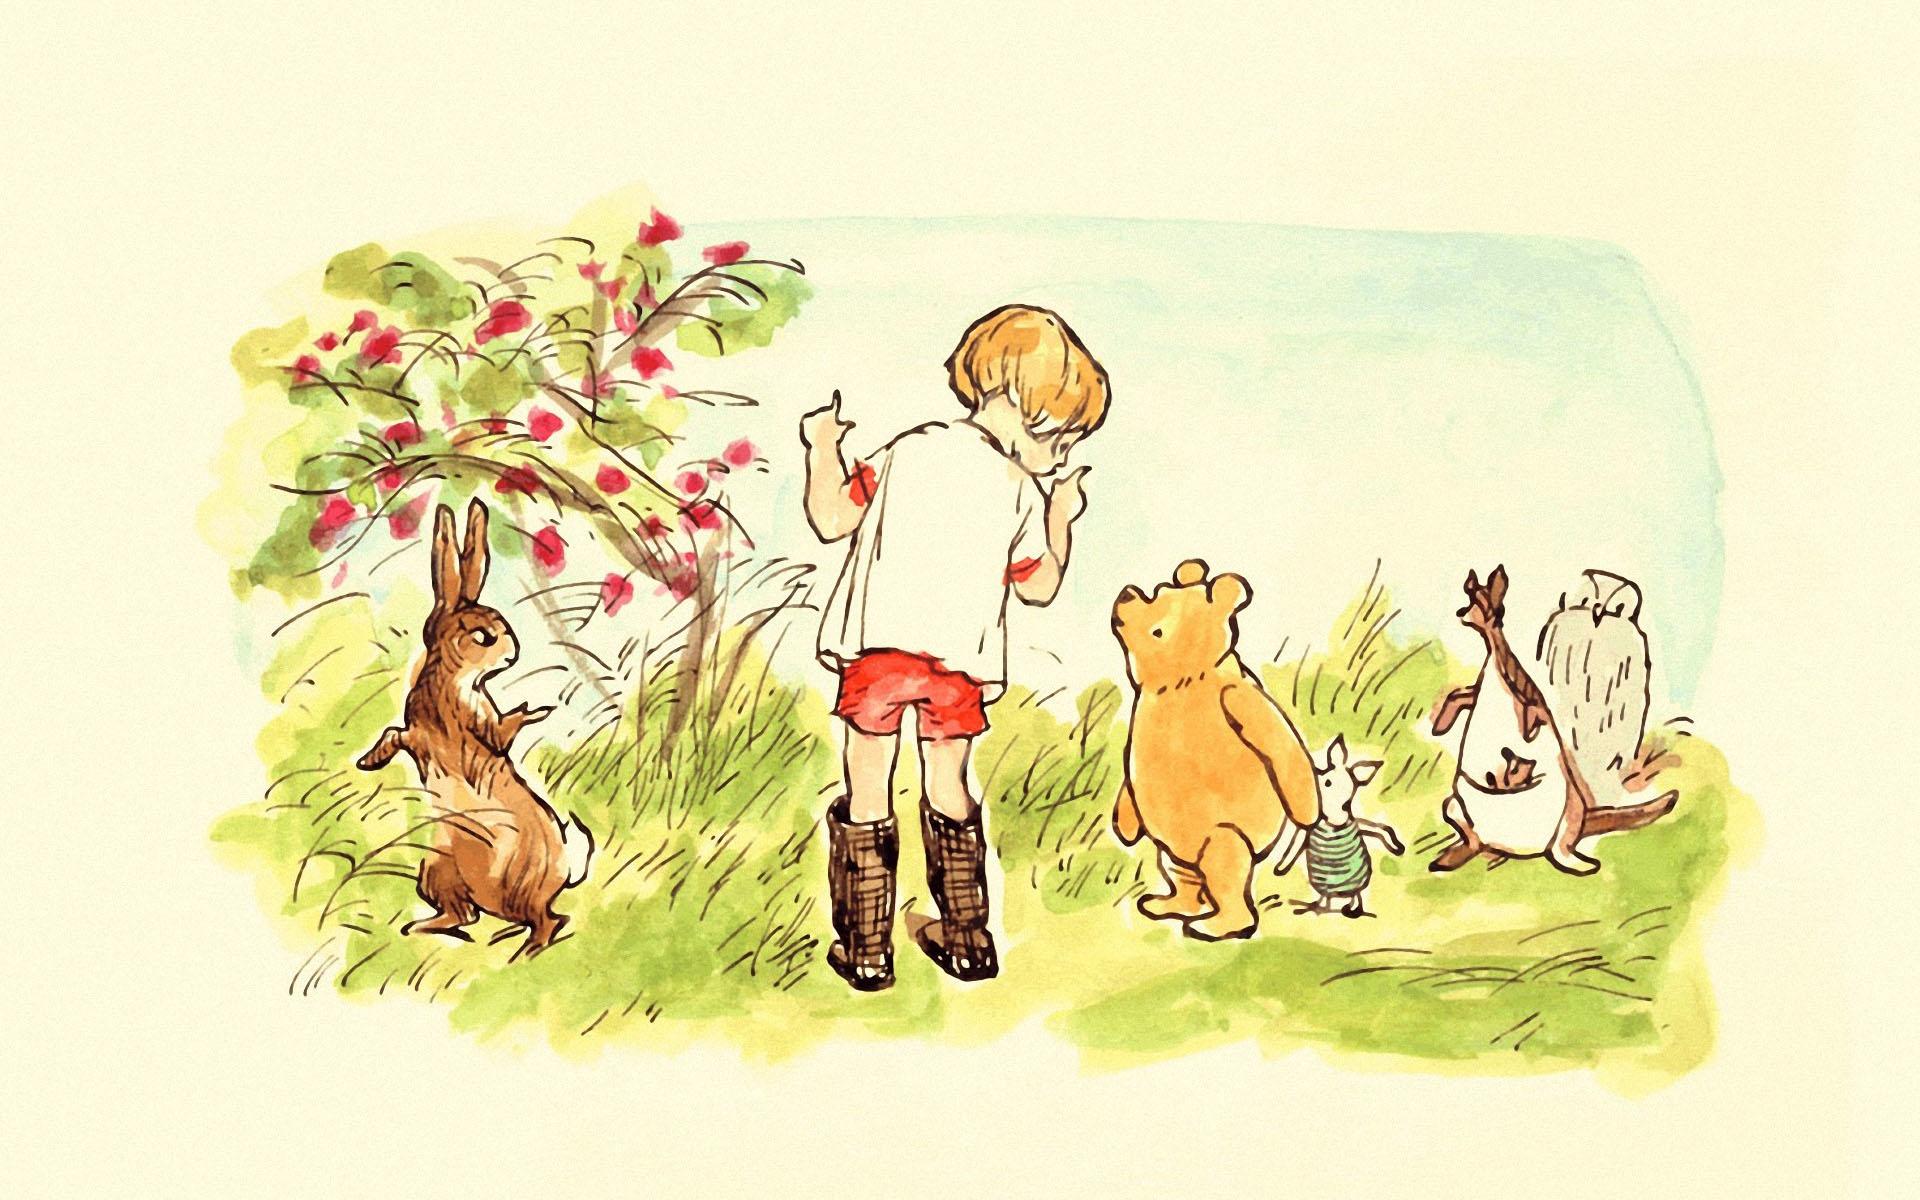 Winnie the Pooh Fall Wallpaper - WallpaperSafari